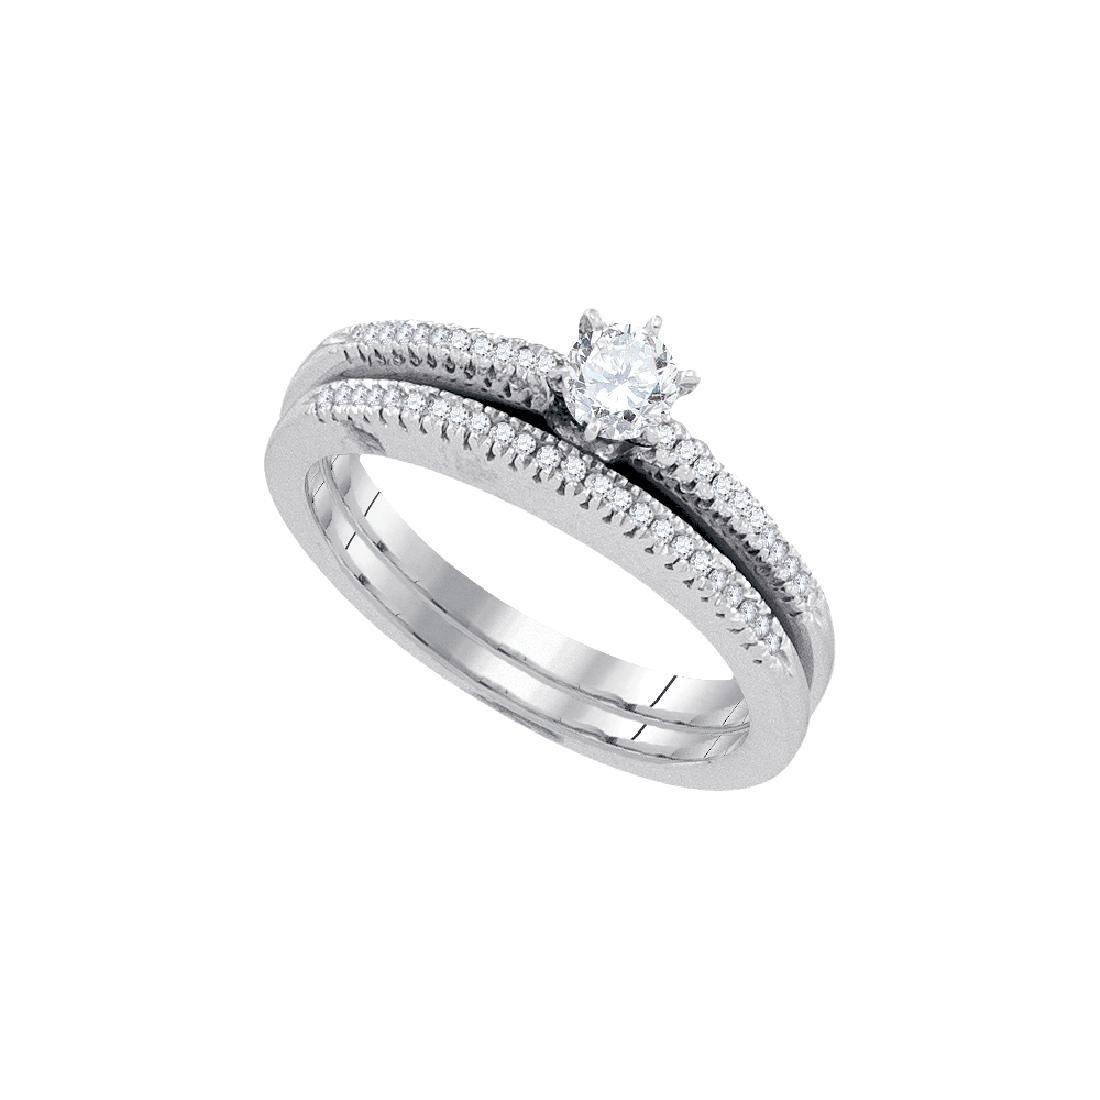 0.33 CTW Natural Diamond Solitaire Bridal Engagement